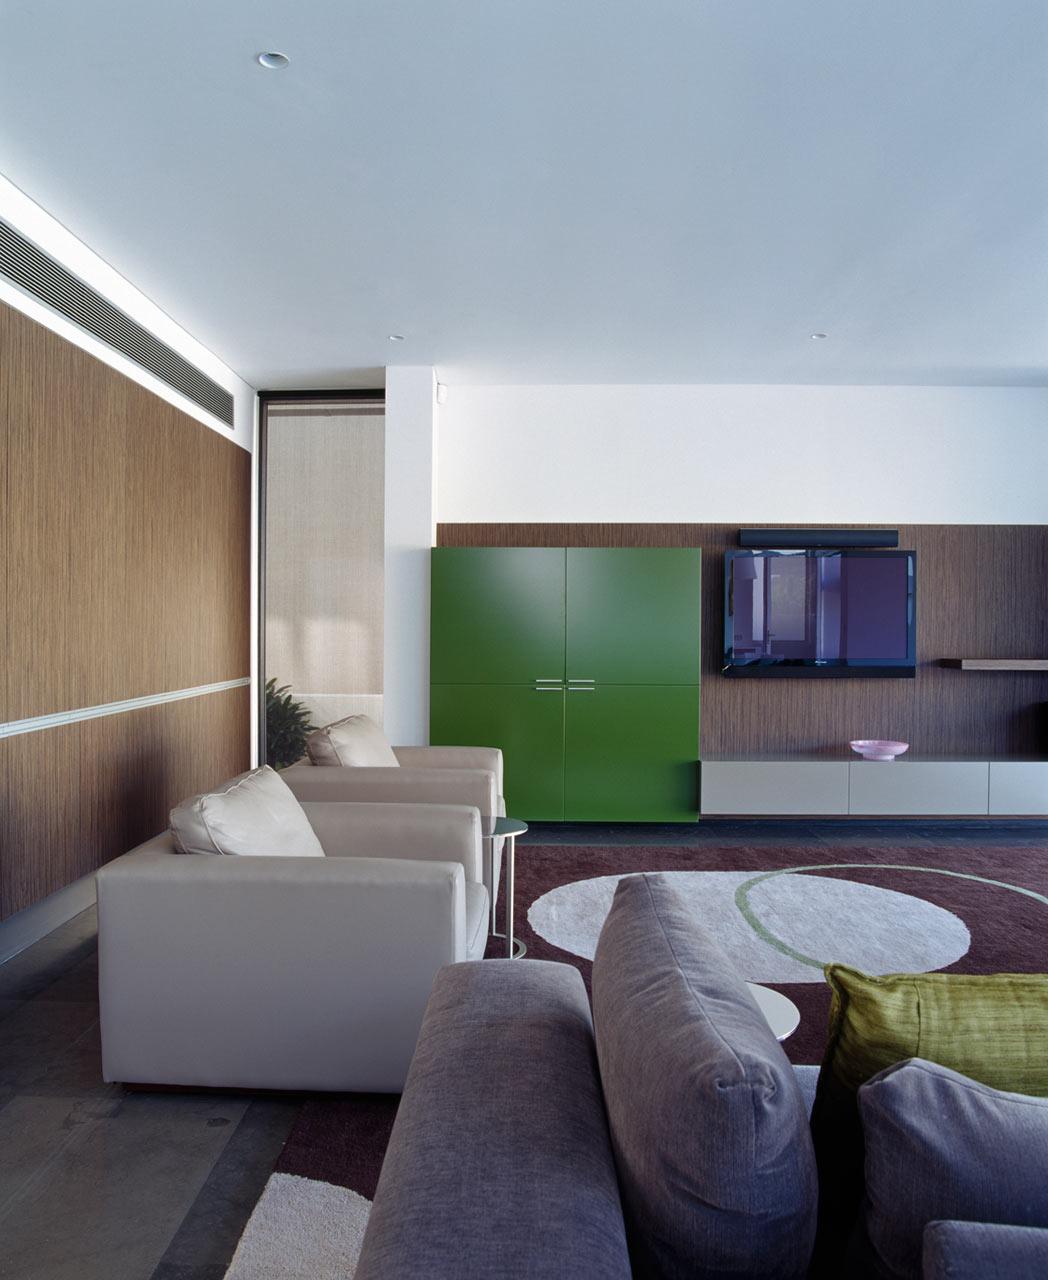 Minosa-Design-Portland-St-5